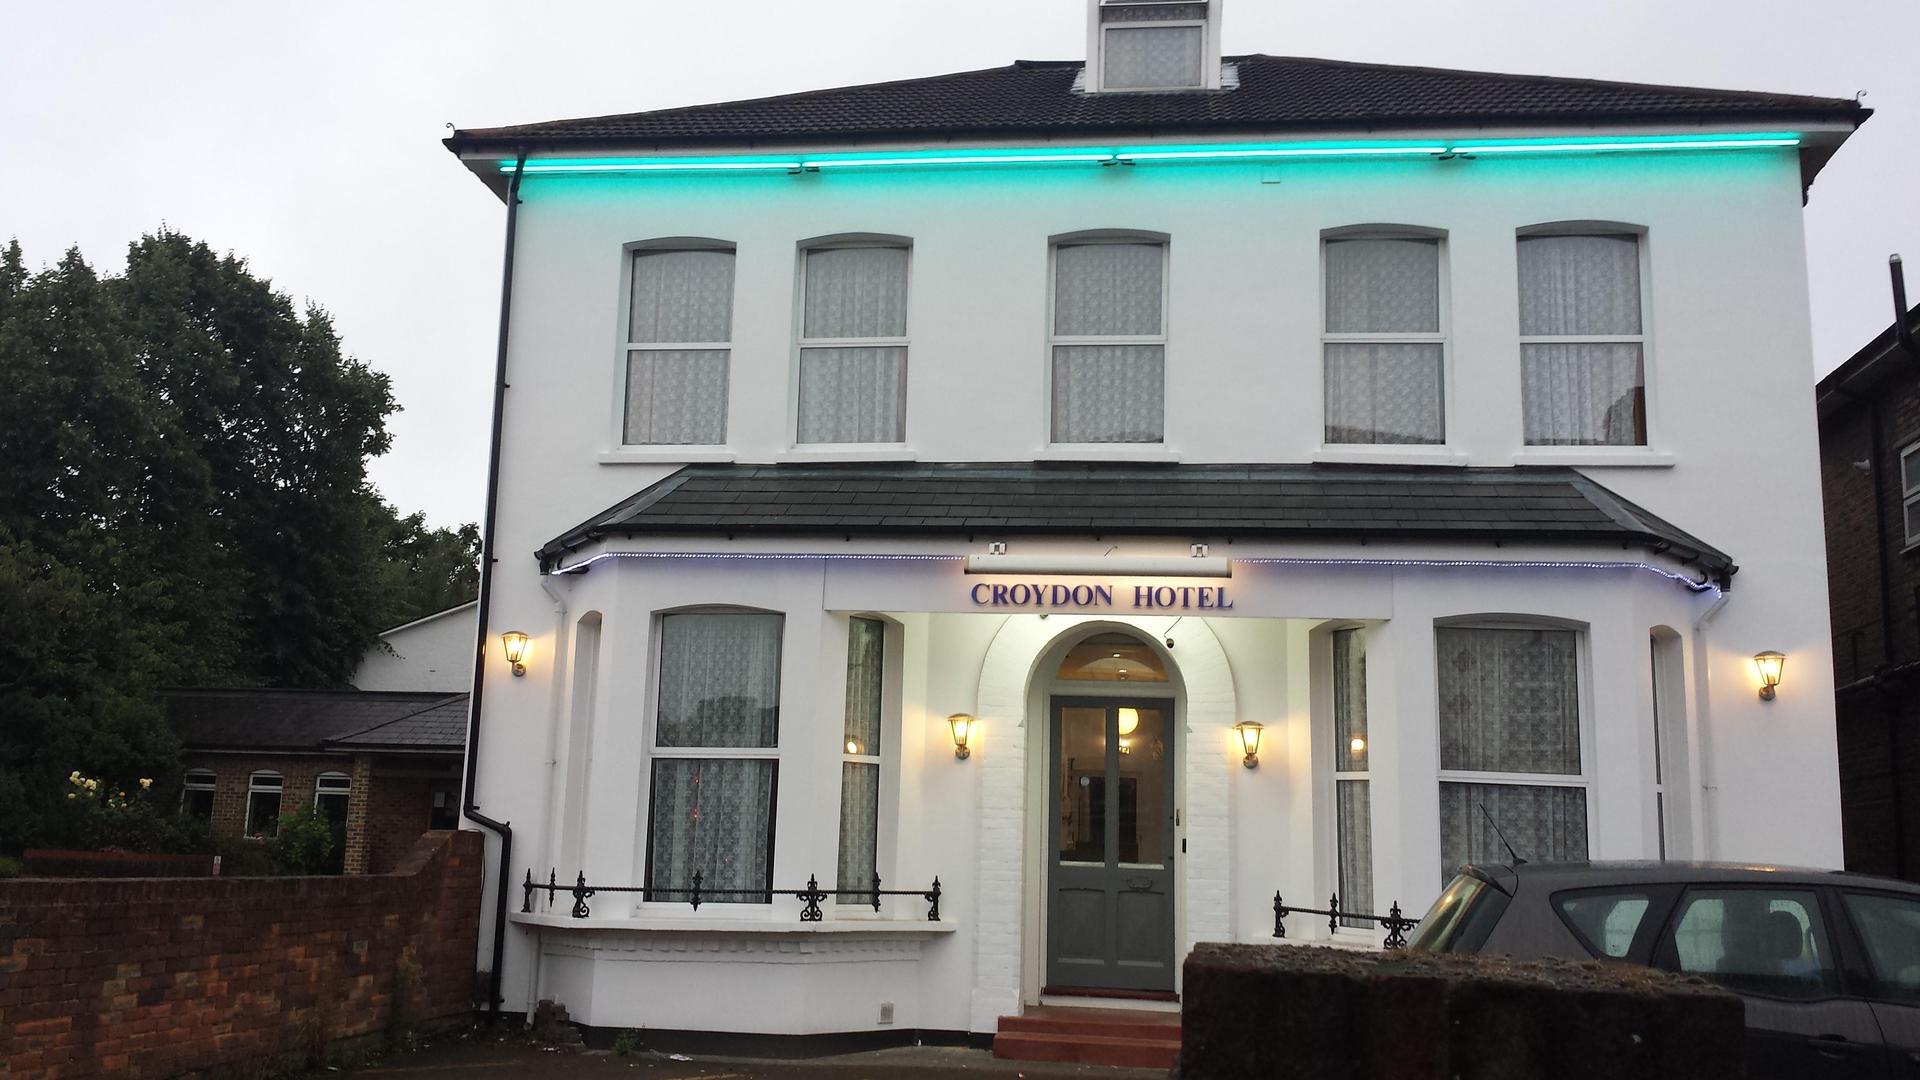 The Croydon Hotel